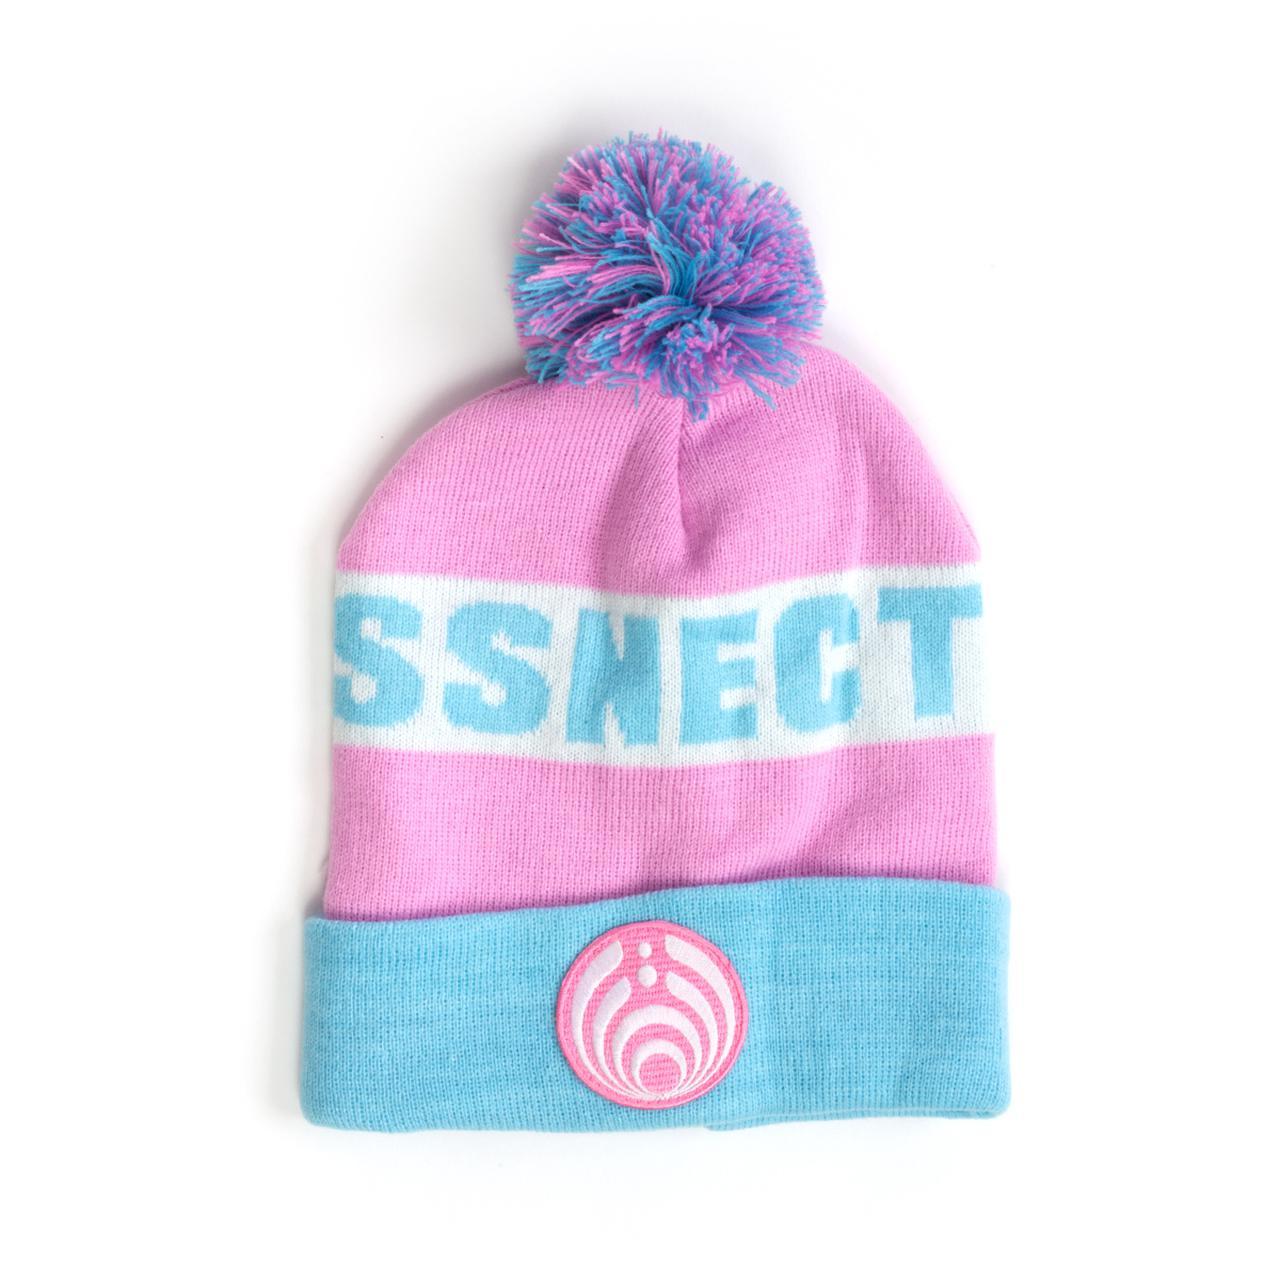 Bassnectar Pink and Blue Custom Patch Knit Beanie 442a168e6a4